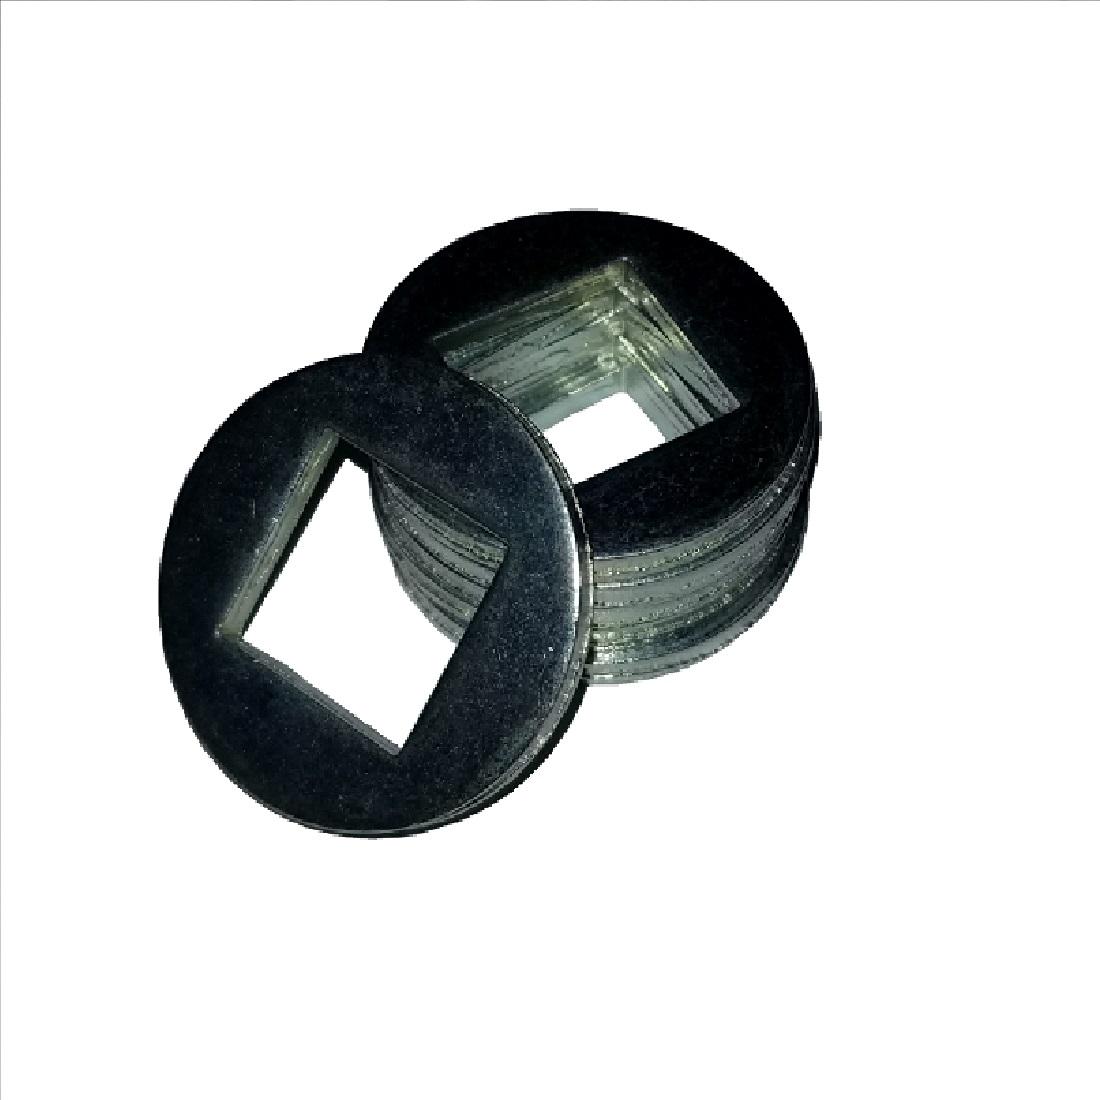 Square ID Washer - 0.434 ID, 1.350 OD, 0.020 Thick, Nylon